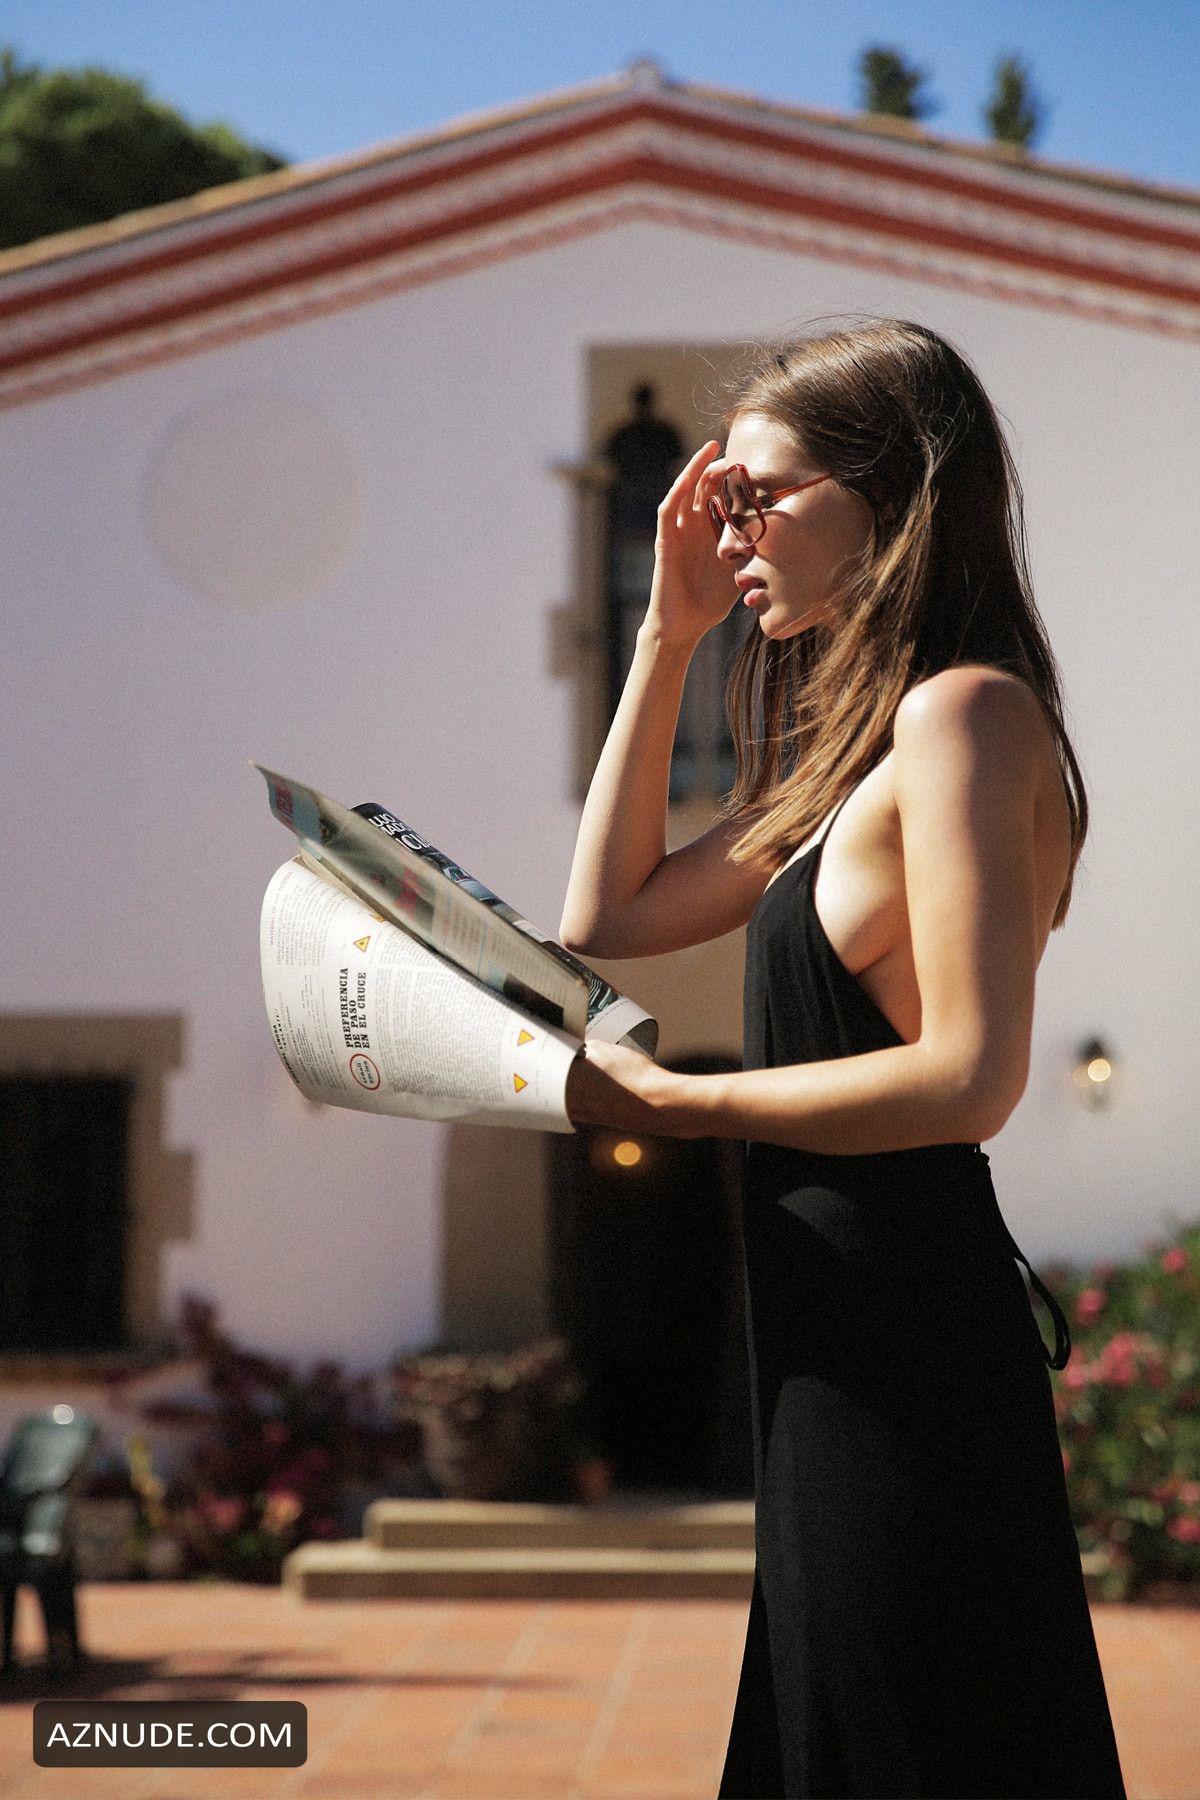 Monika pietrasinska sexy recommendations